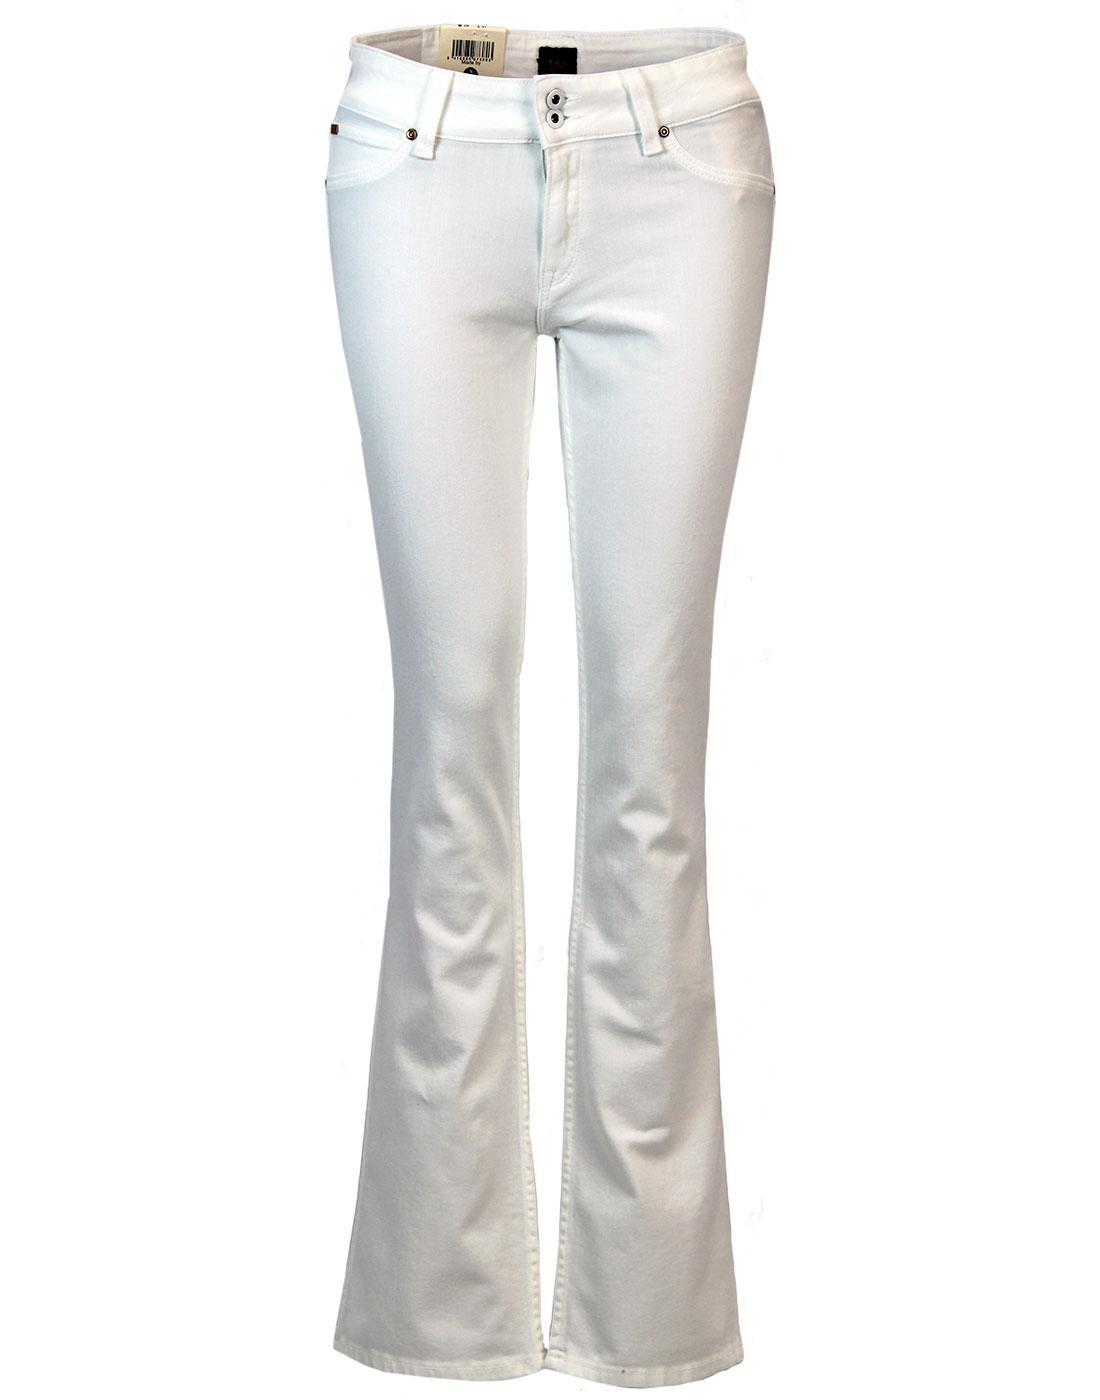 LEE Joliet Retro 1970s White Denim Bootcut Jeans